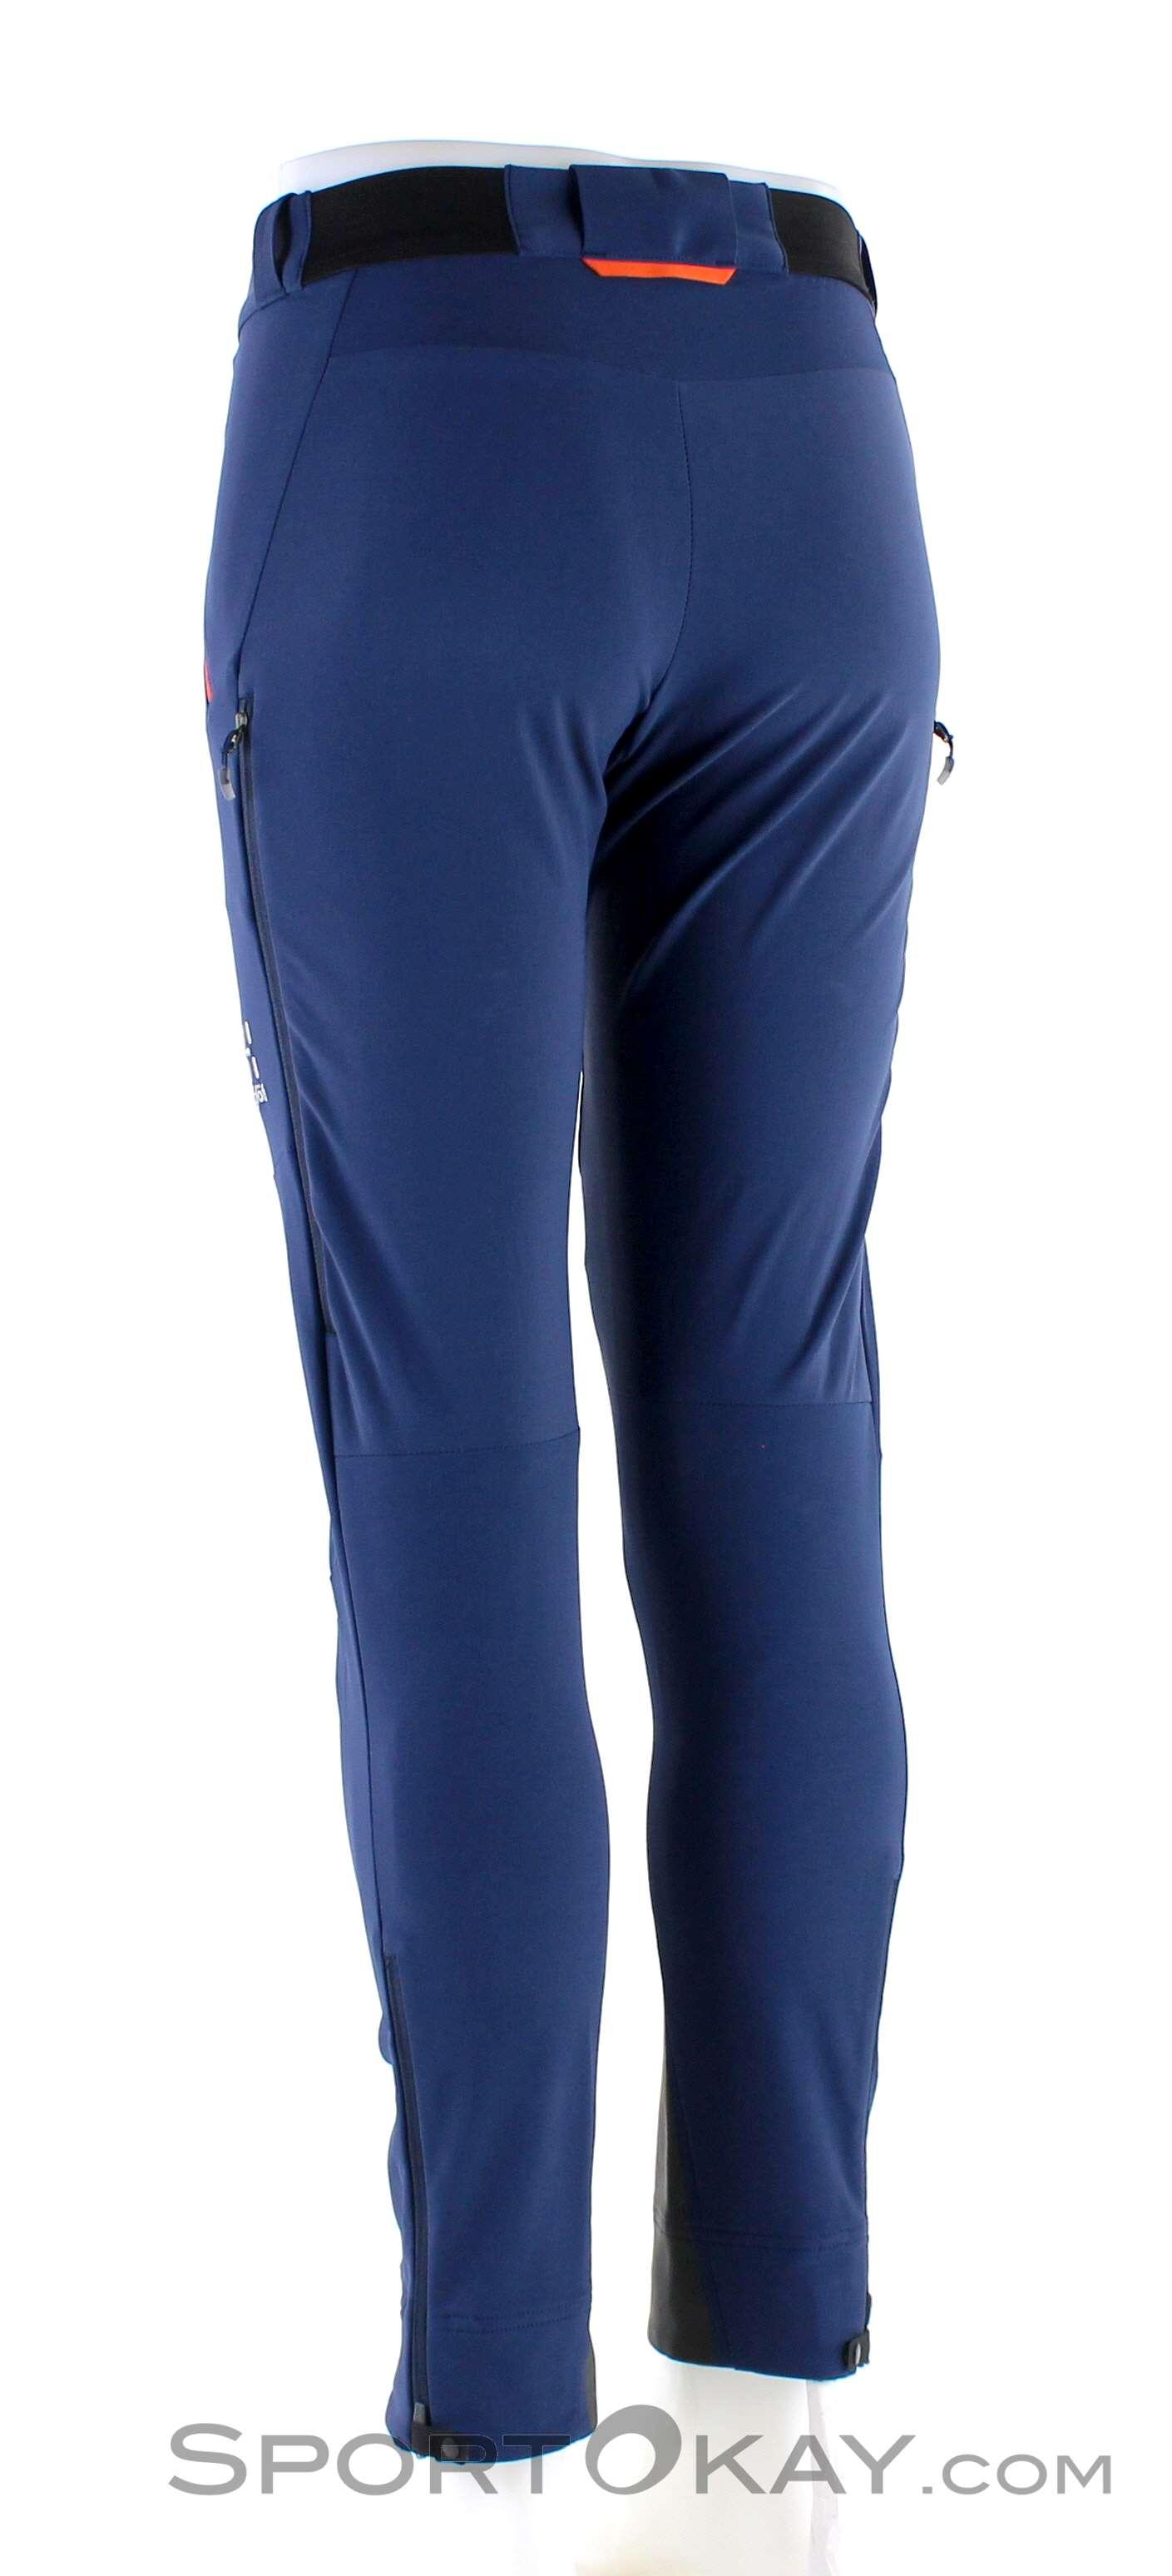 5ff0a67862f3b Haglöfs Roc Fusion Pant Mens Outdoor Pants, Haglöfs, Blue, , Male, 0009